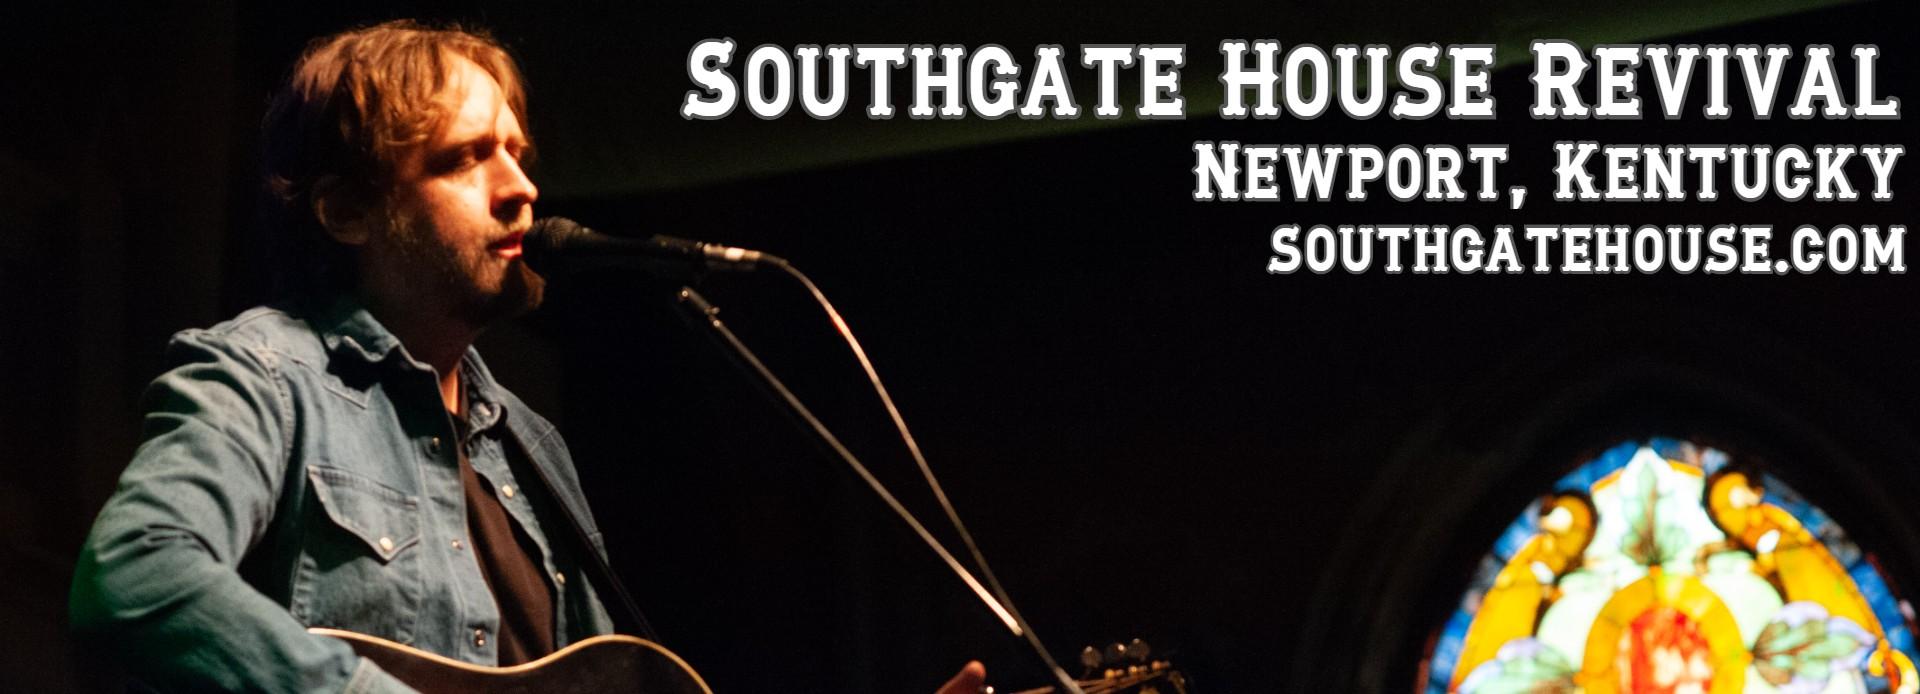 Southgate House Revival